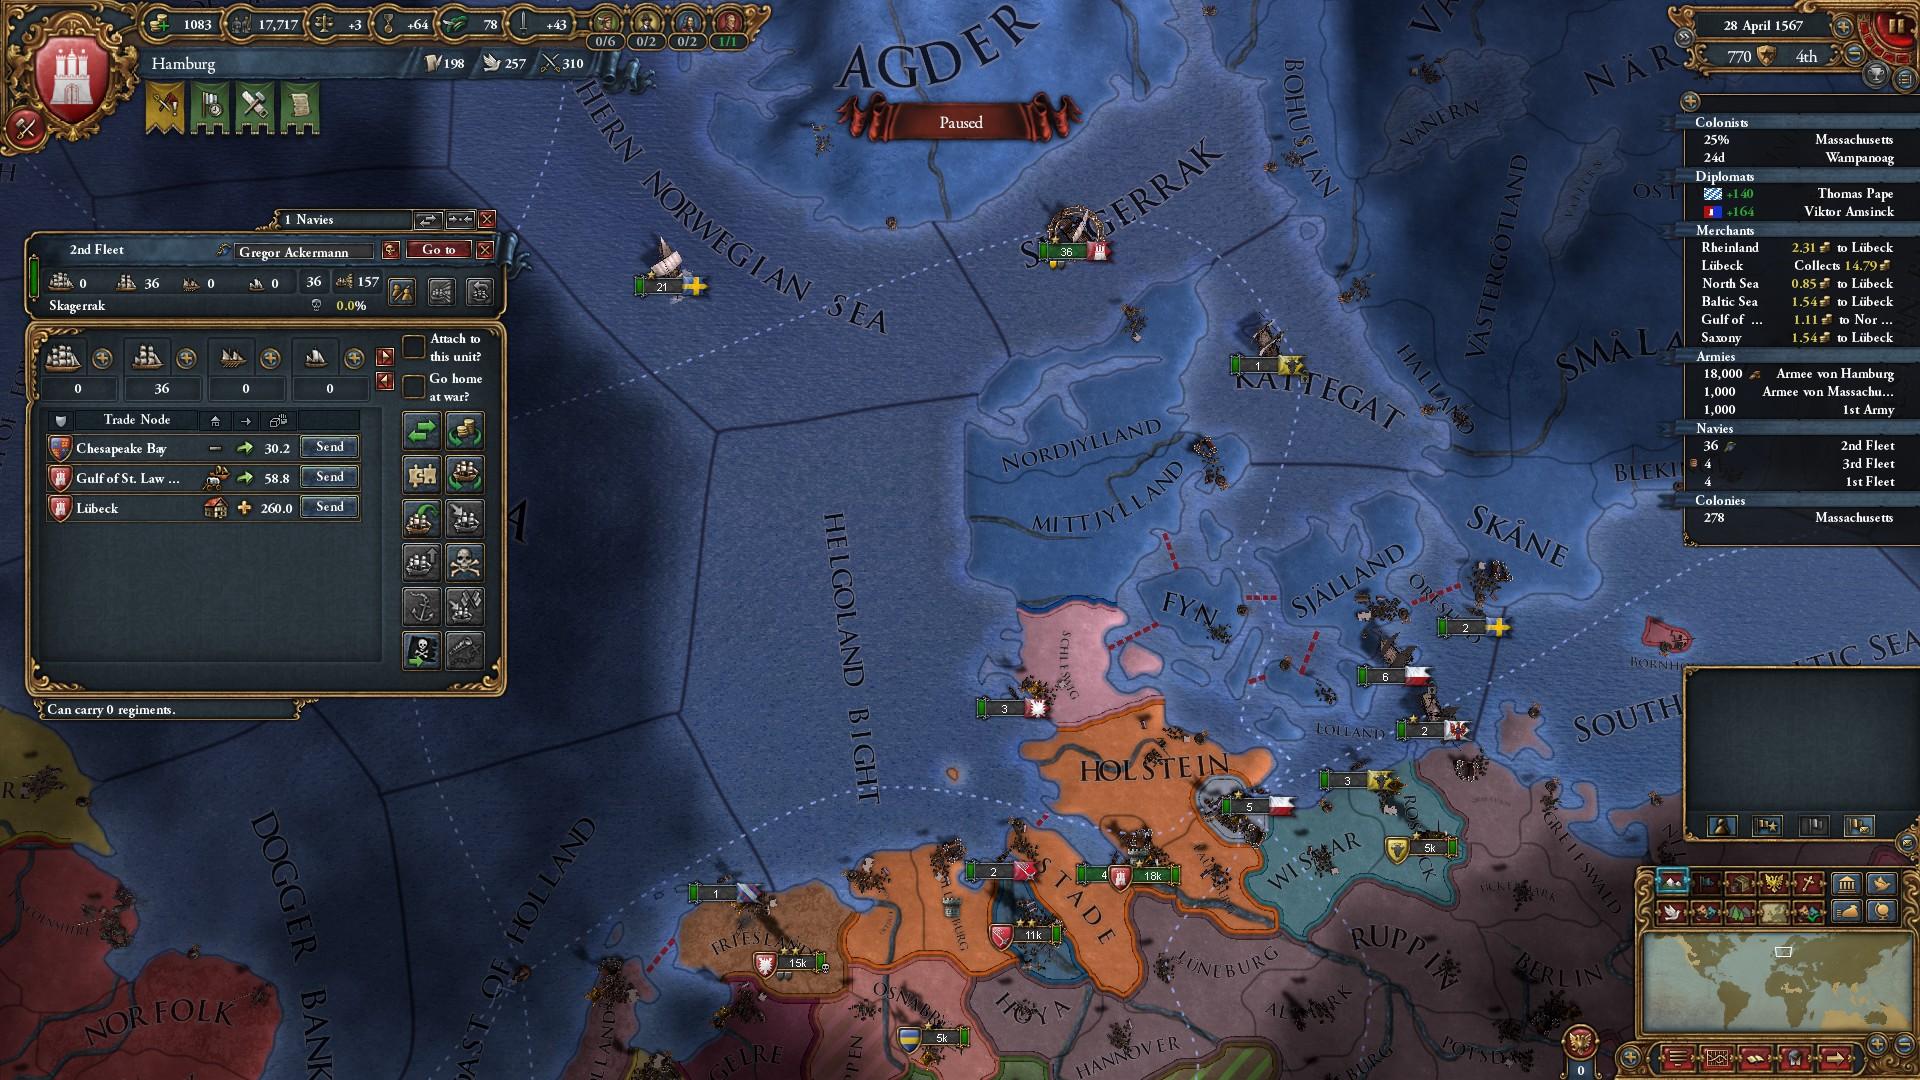 Szwecja   Europa Universalis IV PL Handel oh Handel... 9